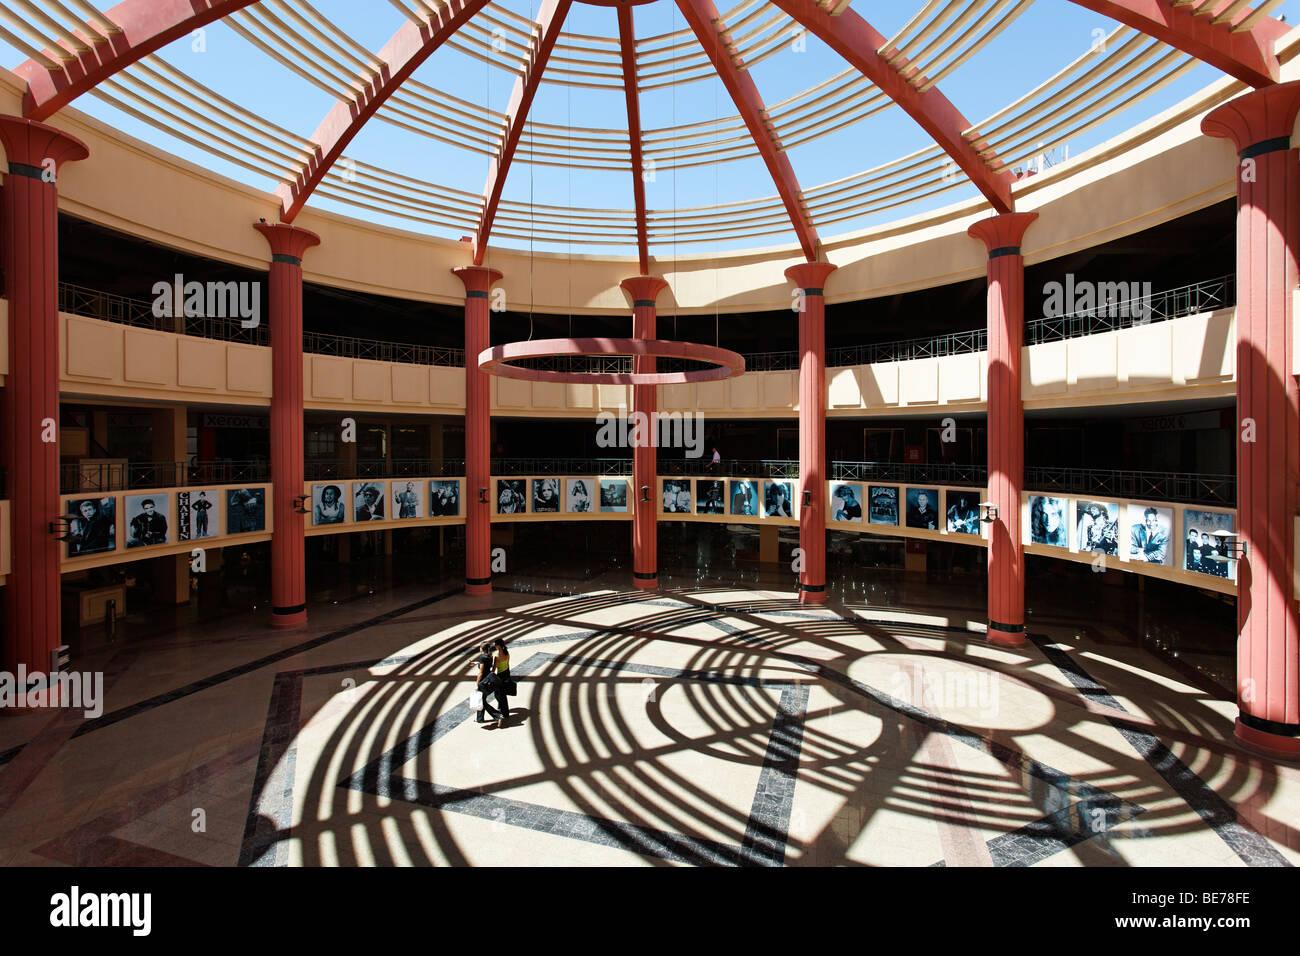 Shopping mall, Esplanade, Yussuf Afifi road, Hurghada, Egypt, Red Sea, Africa - Stock Image